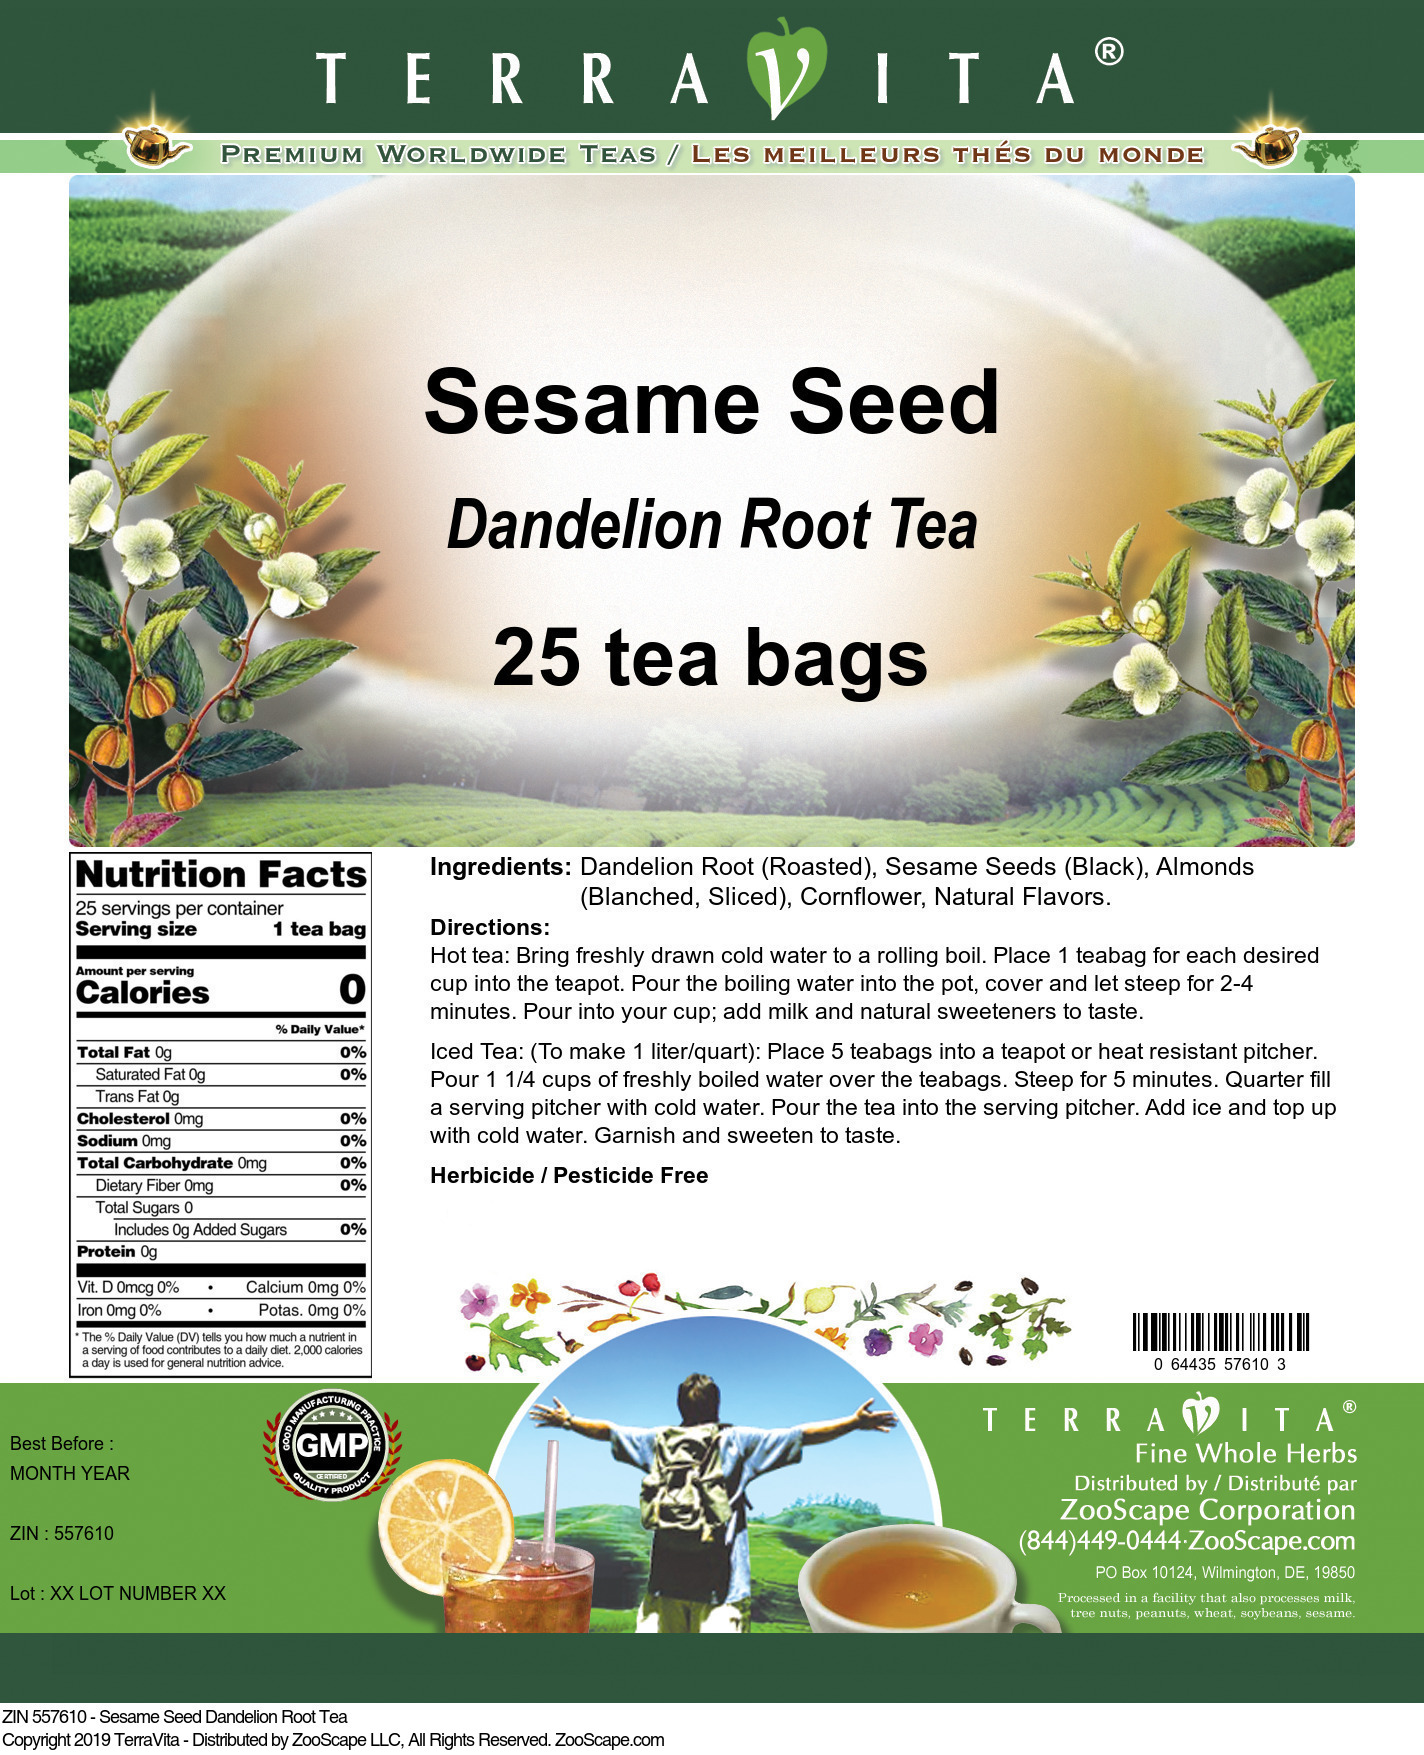 Sesame Seed Dandelion Root Tea